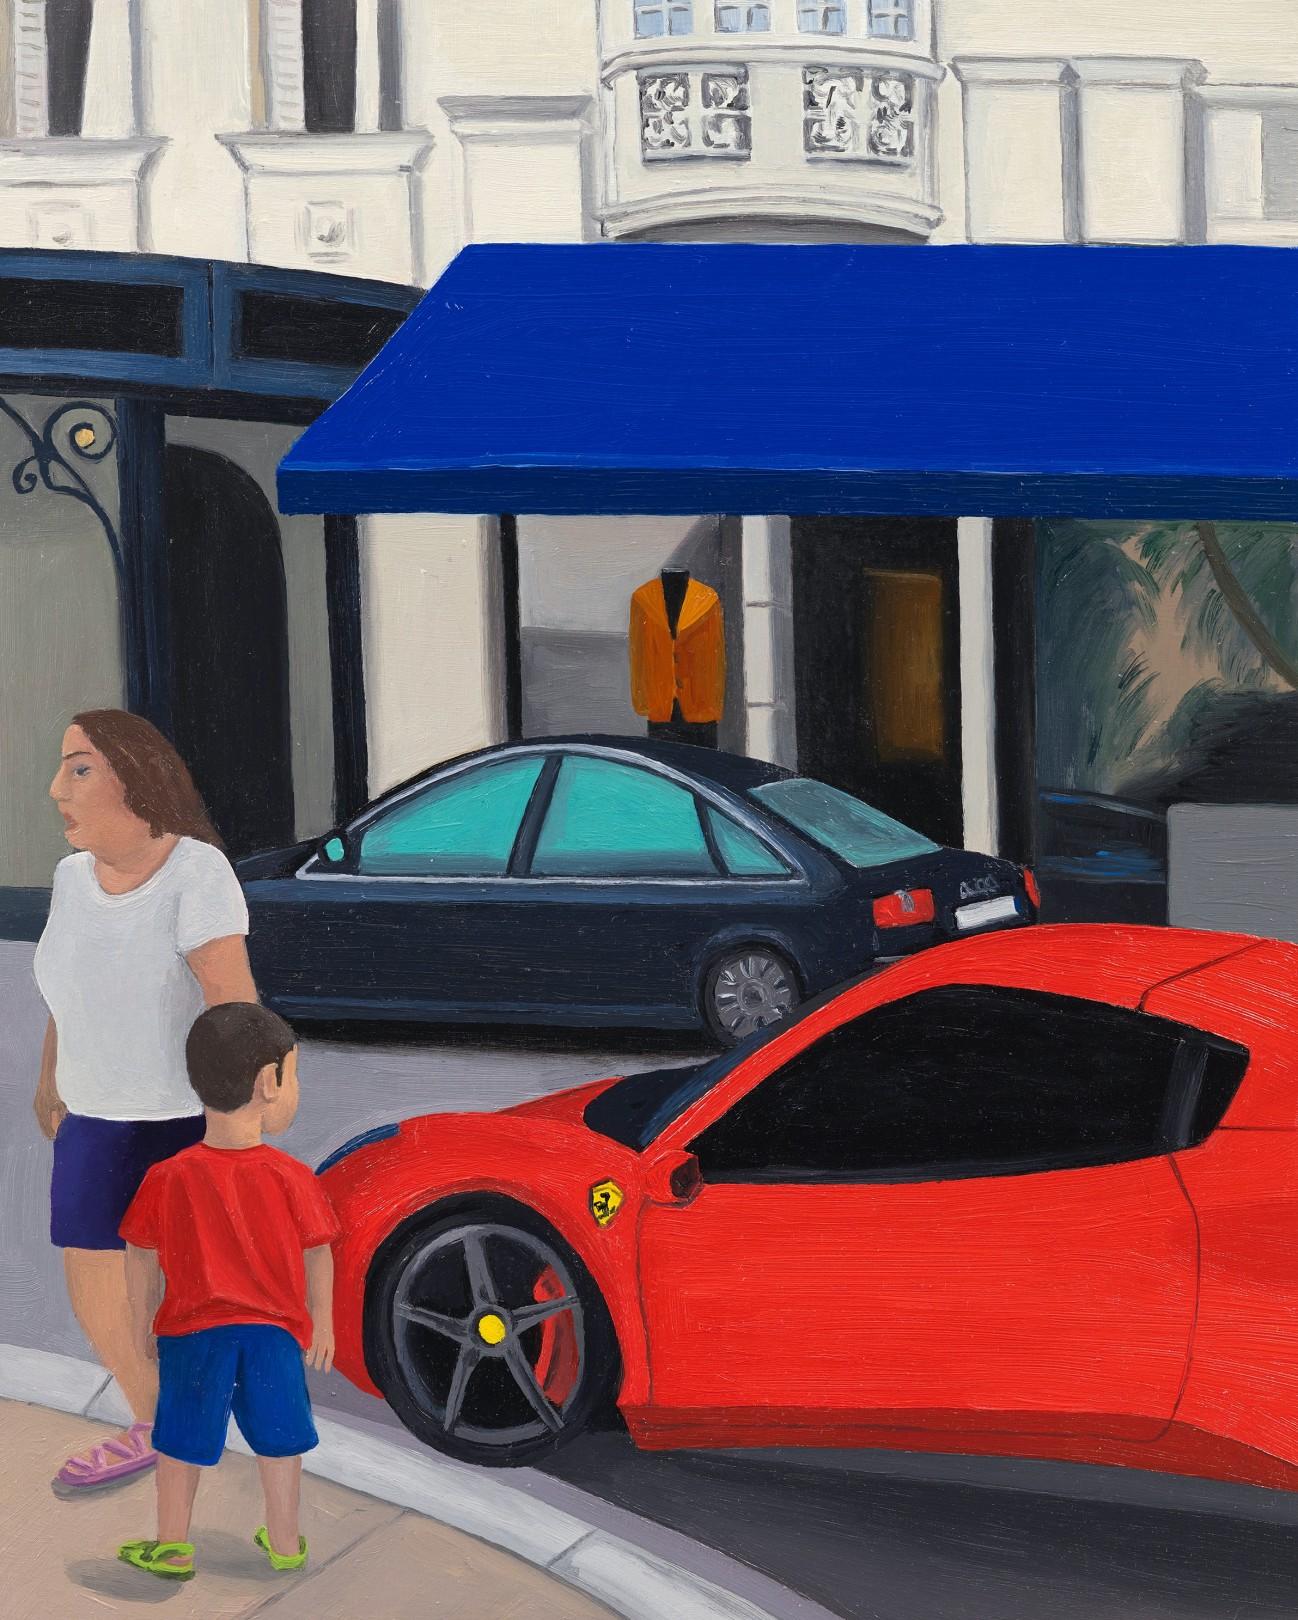 Boy and Ferrari, Monaco, 2020 Oil on panel 25.5 x 20 cm. / 10 x 8 in.